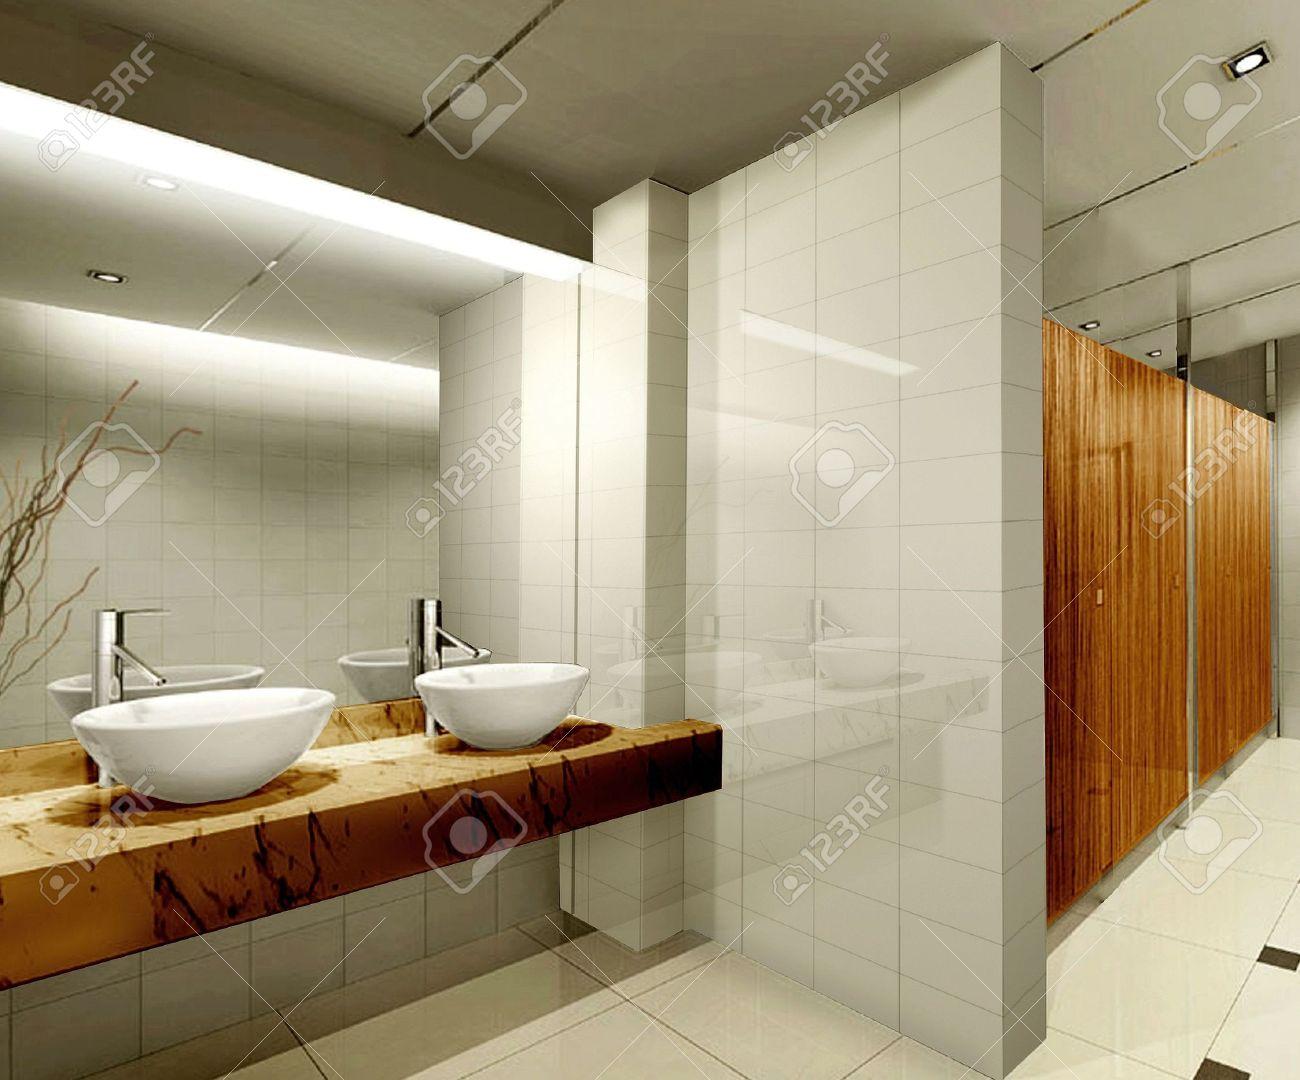 interior design moderno bagno elegante. 3d render foto royalty ... - Bagni Eleganti Moderni